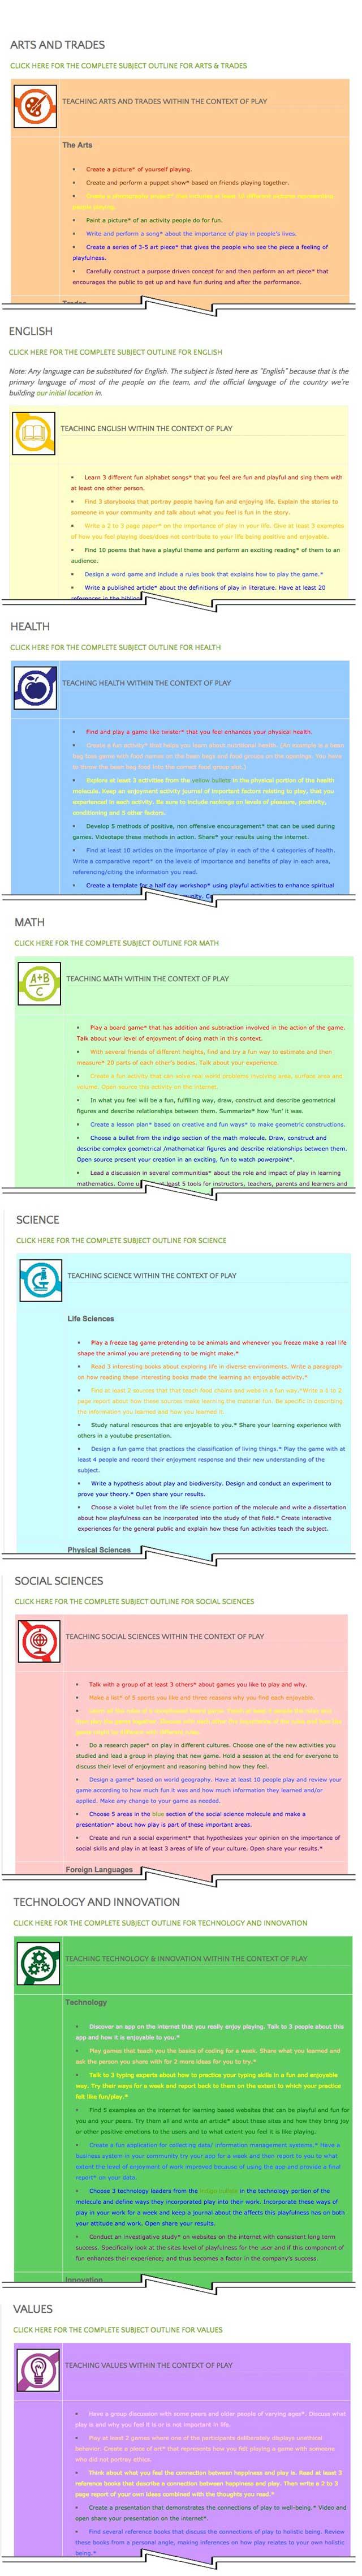 Plan Lesson plan, One Community blog 199